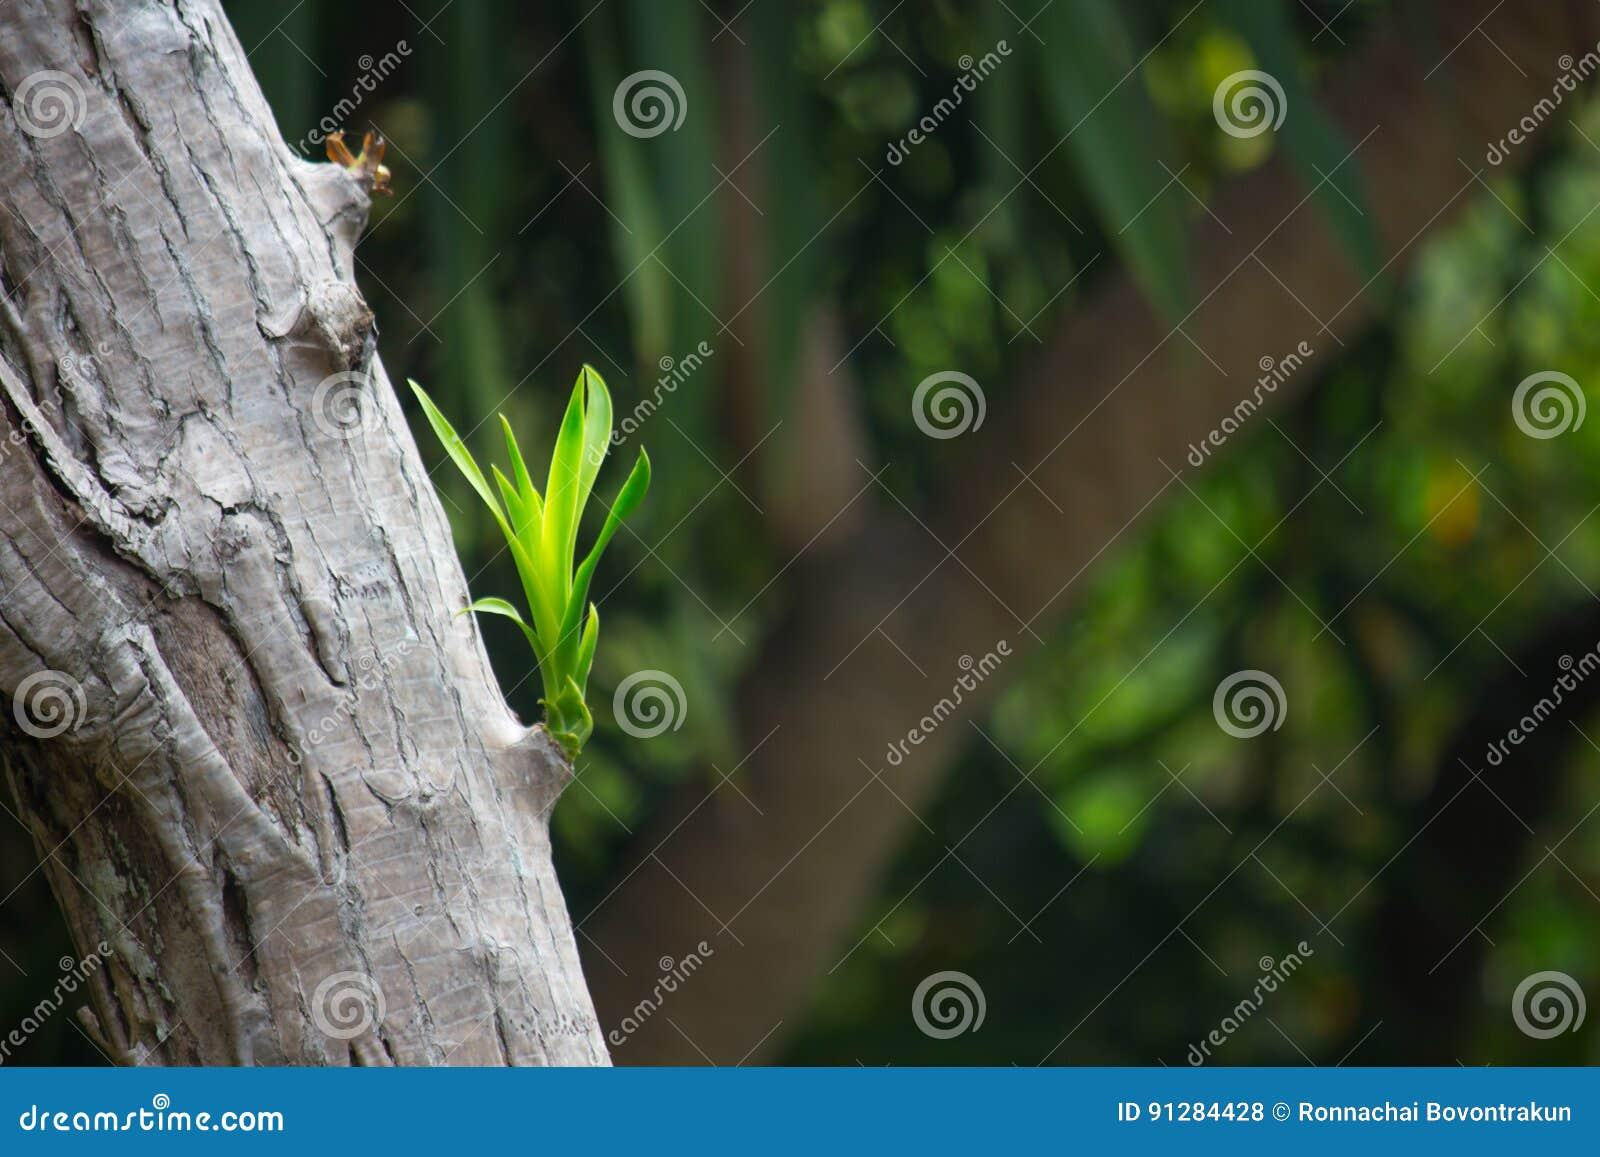 Grön växande fors